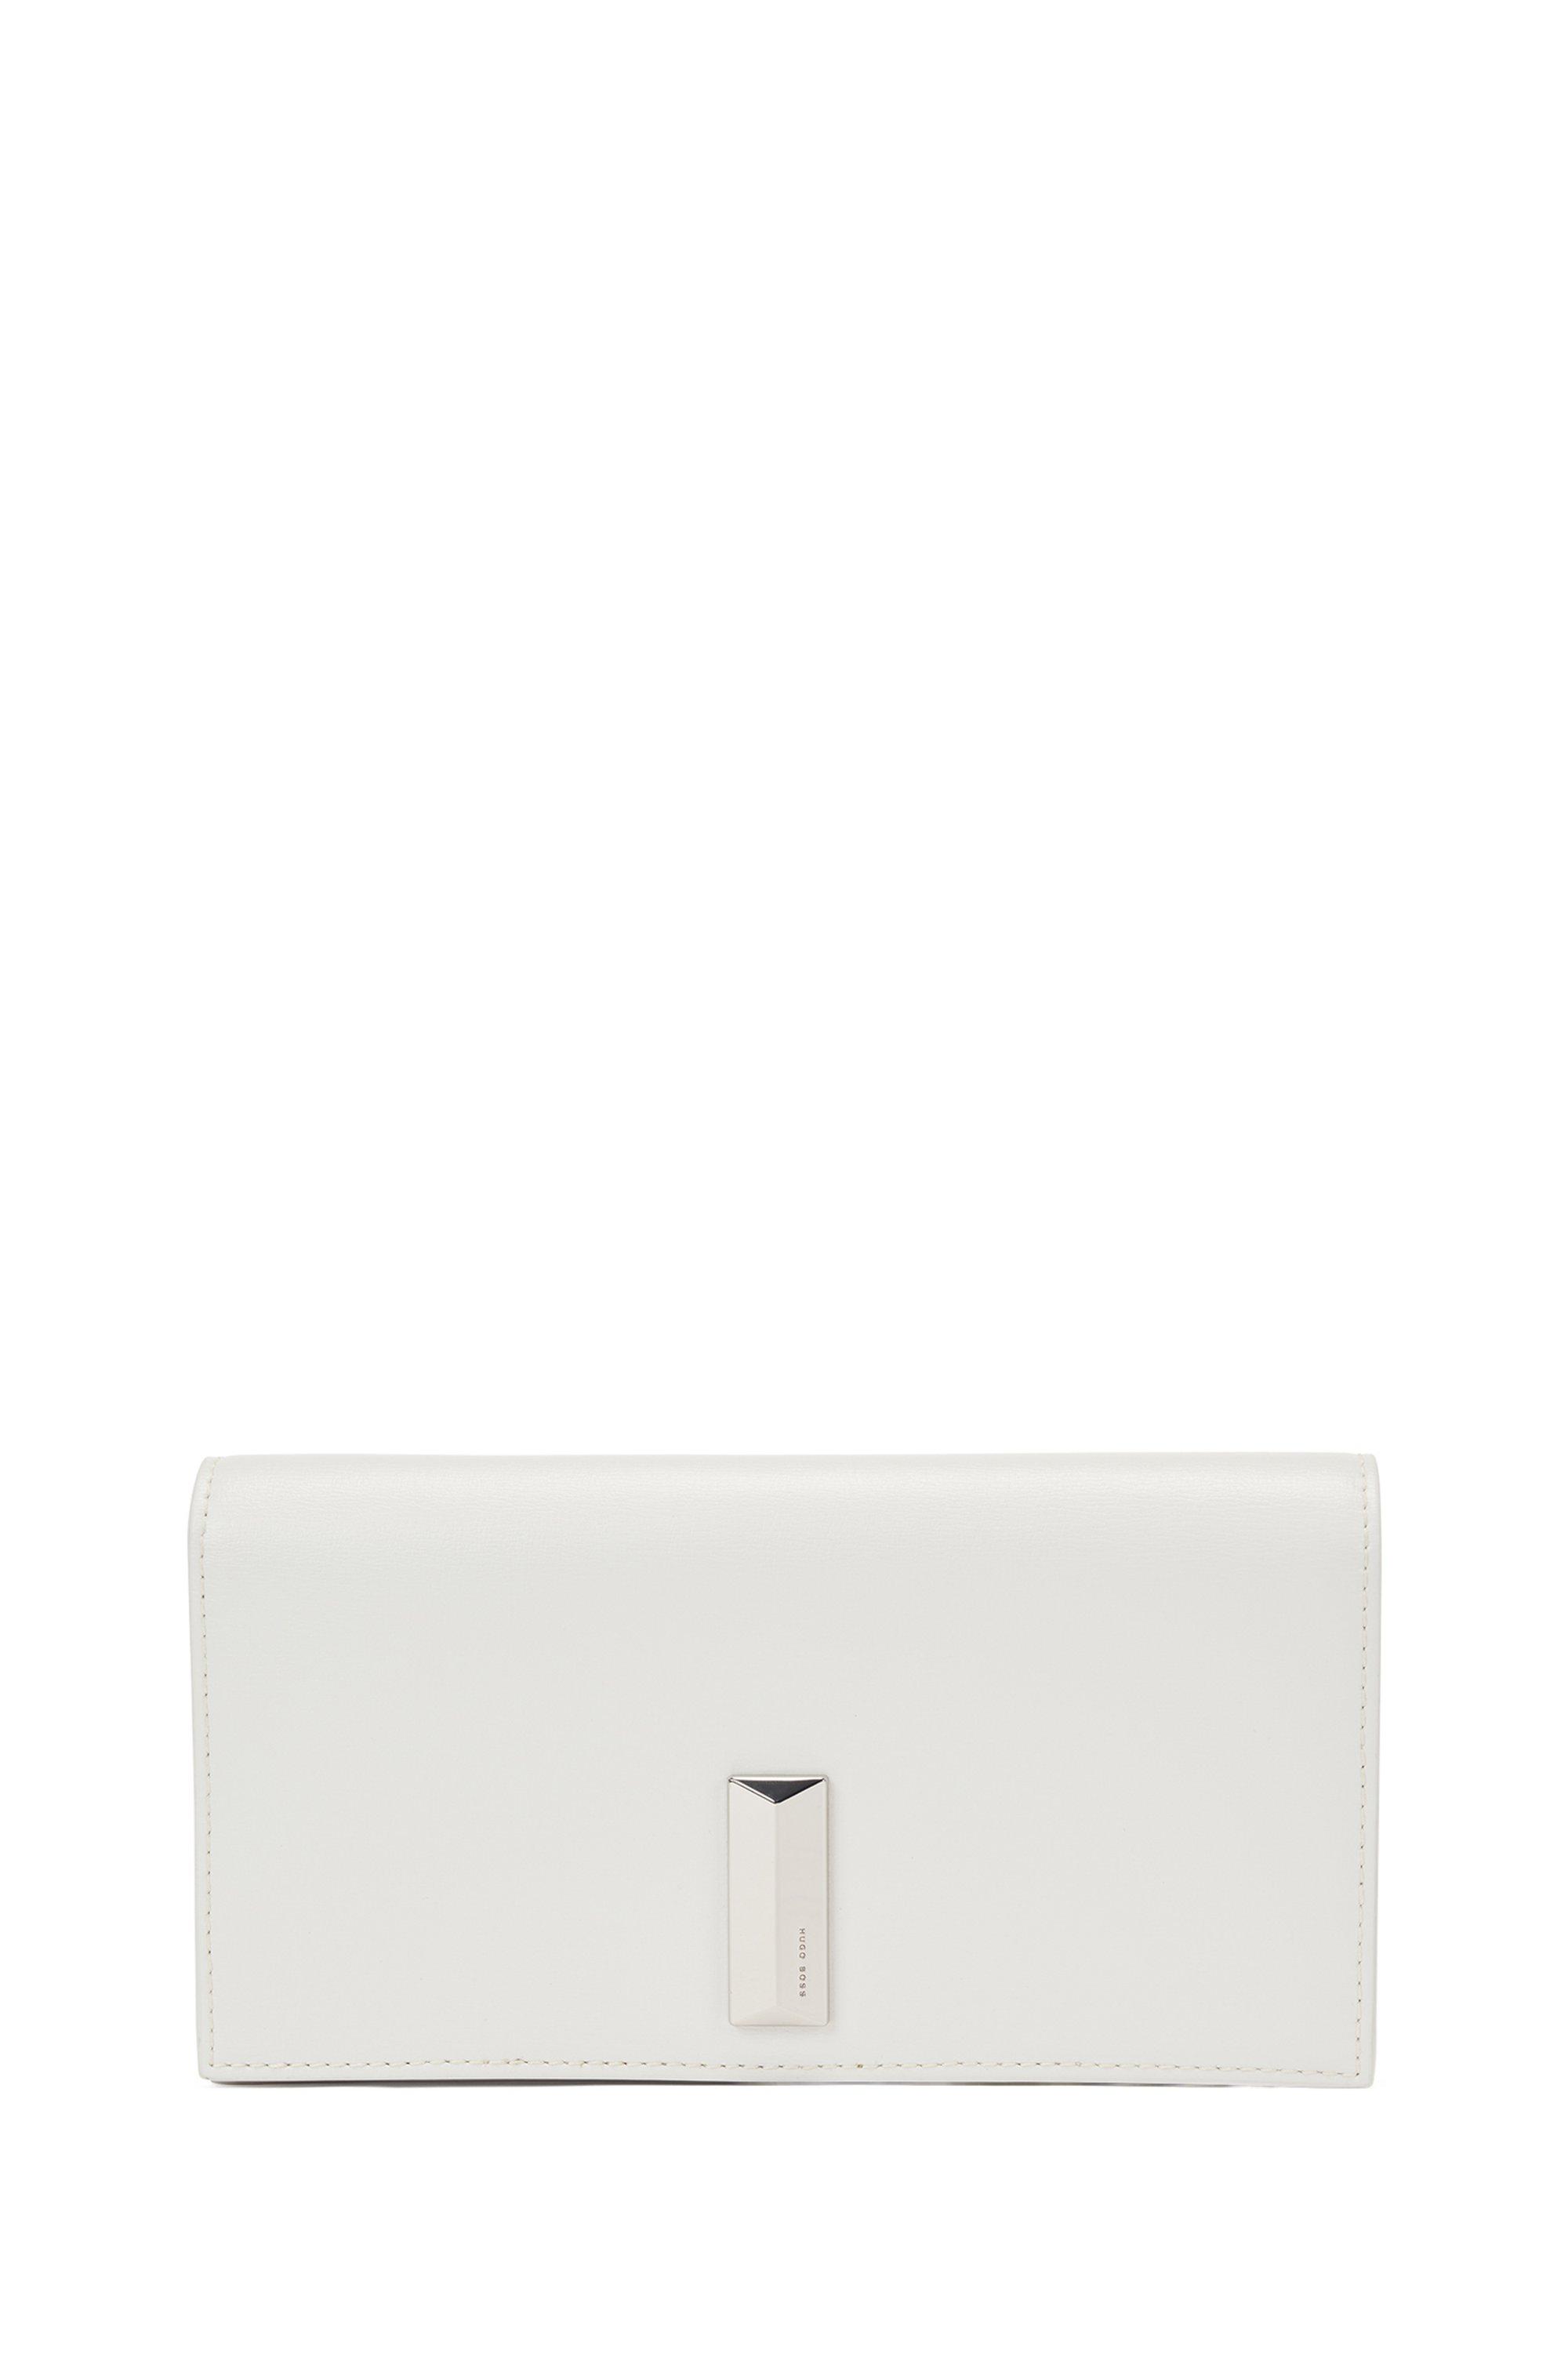 Mini sac en cuir avec garniture métallique en forme de pyramide, Blanc